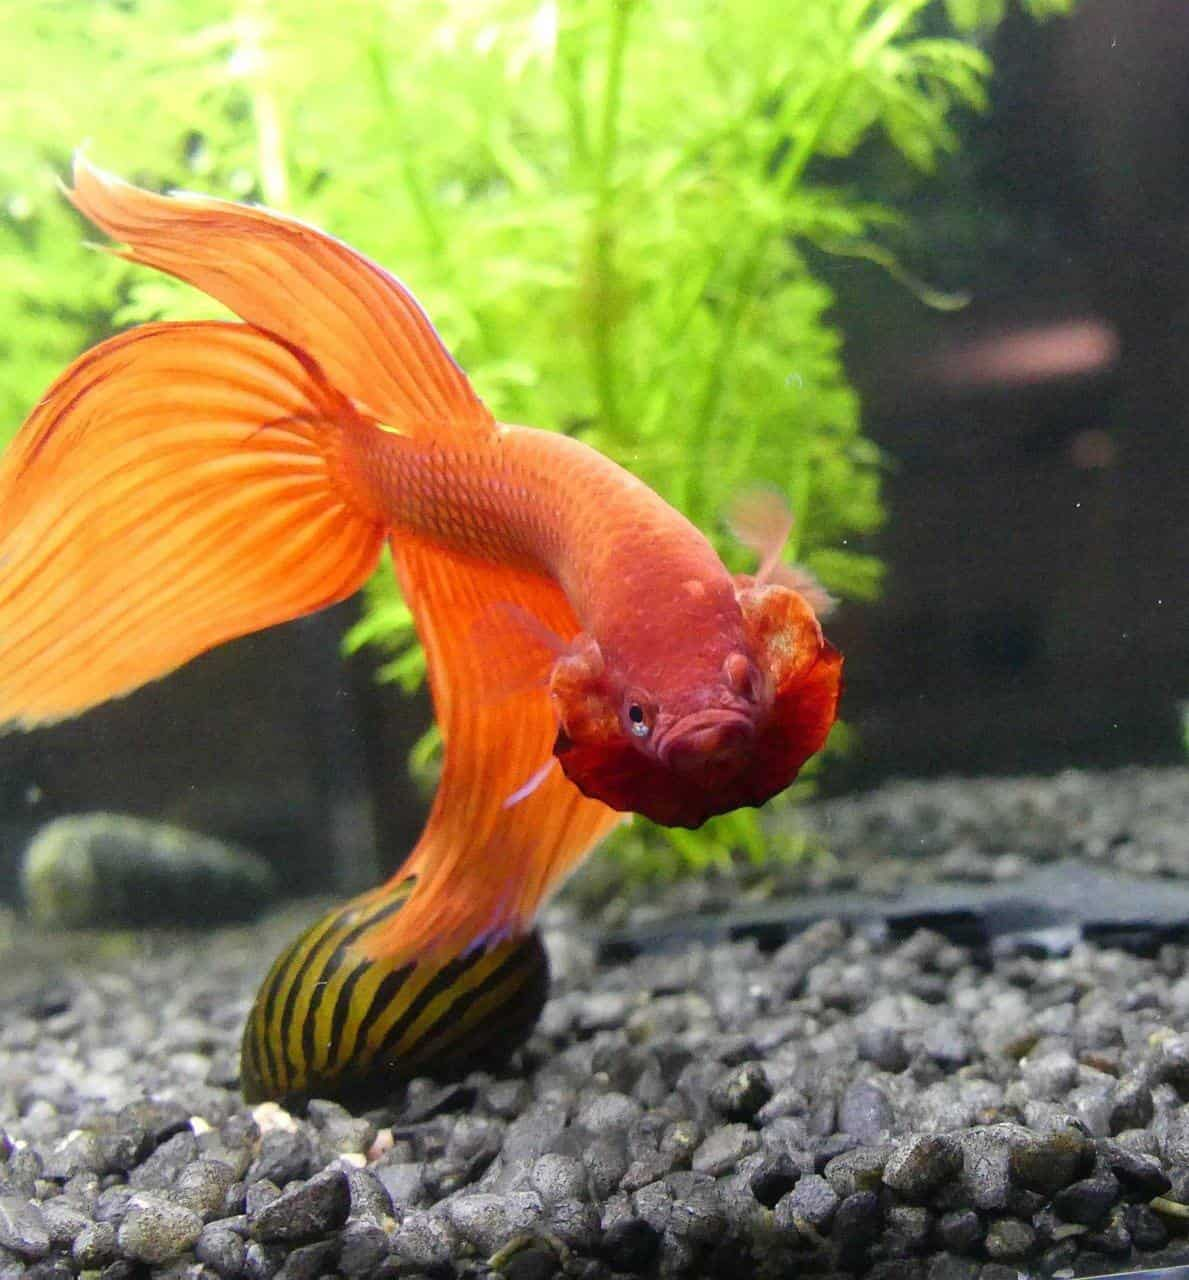 betta siamese fighting fish flaring its own gills